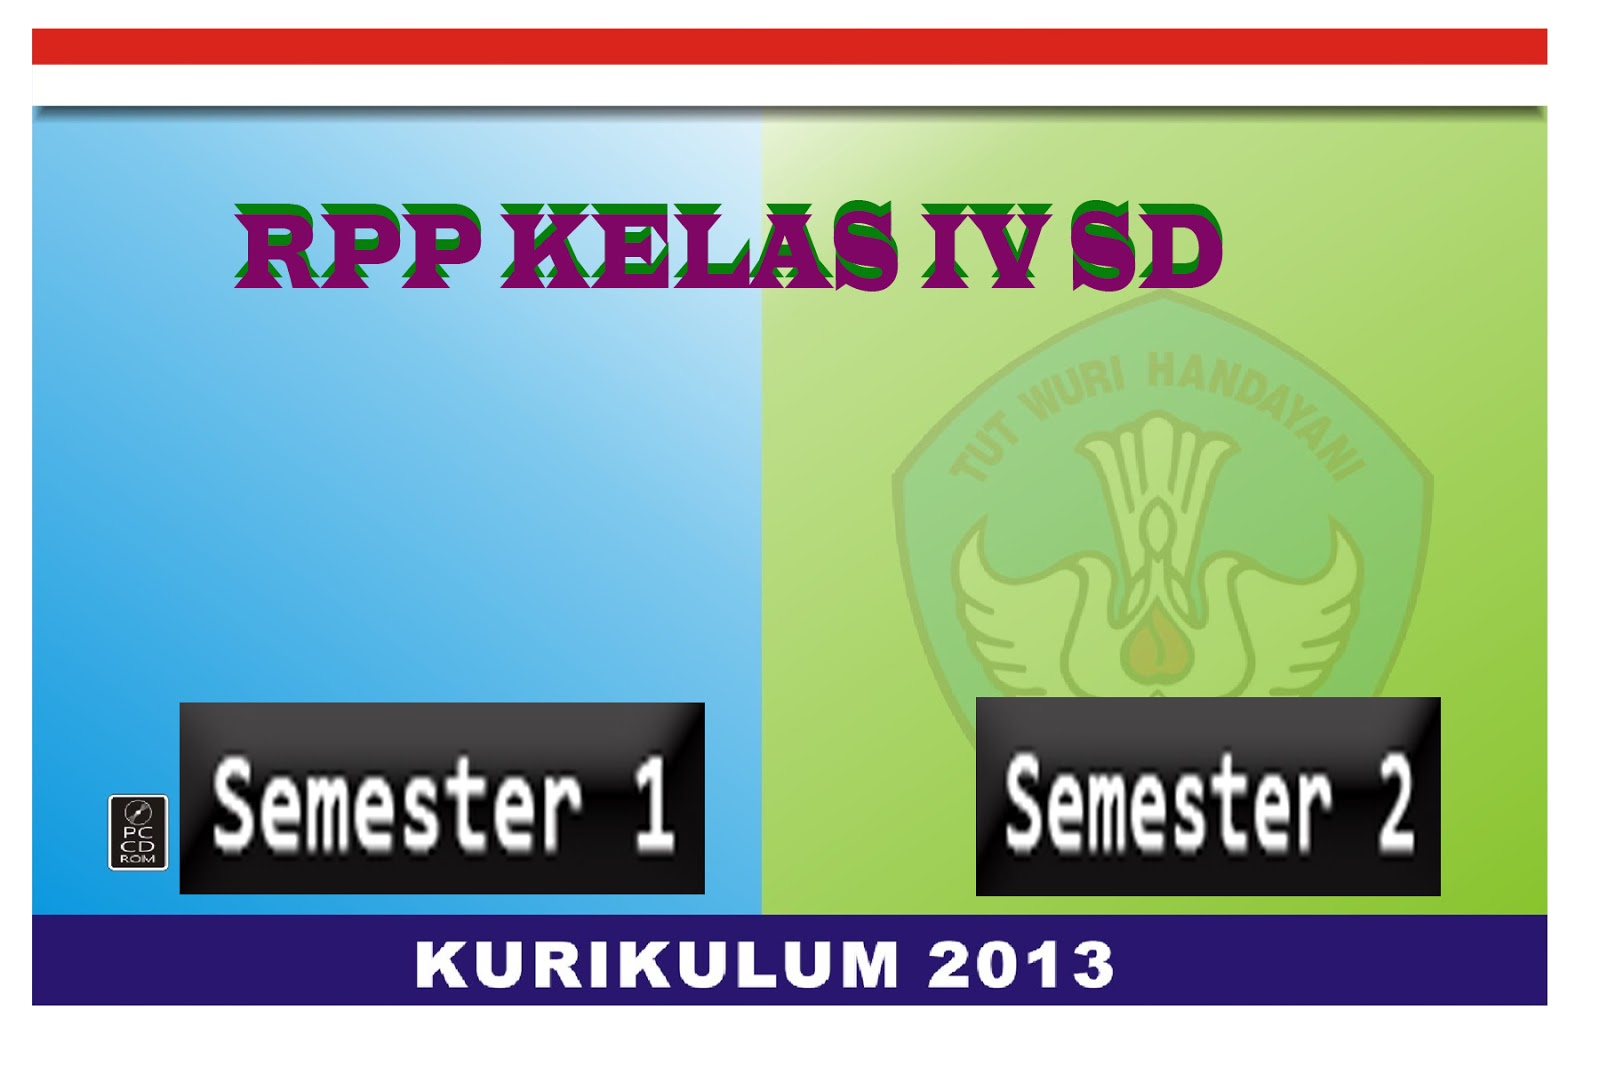 Download Rpp Kelas 4 Sd Kurikulum 2013 File Sekolah Kita File Sekolah Kita